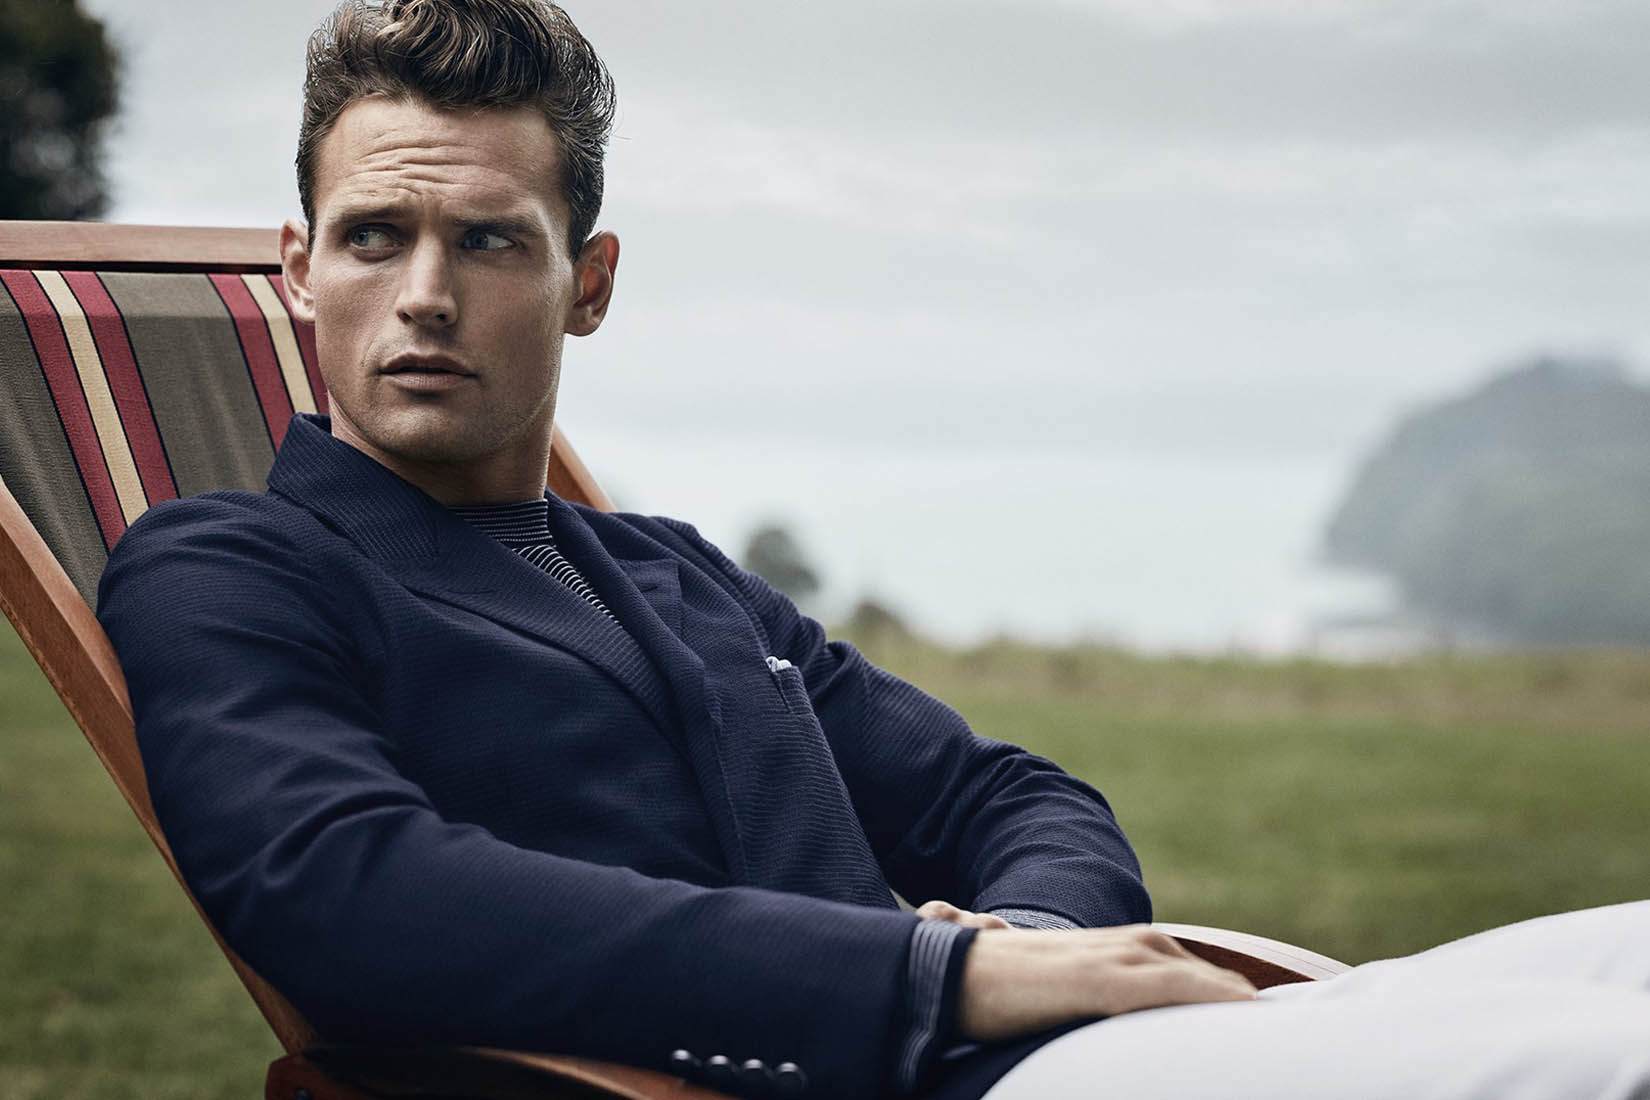 best suit brands men dunhille review Luxe Digital